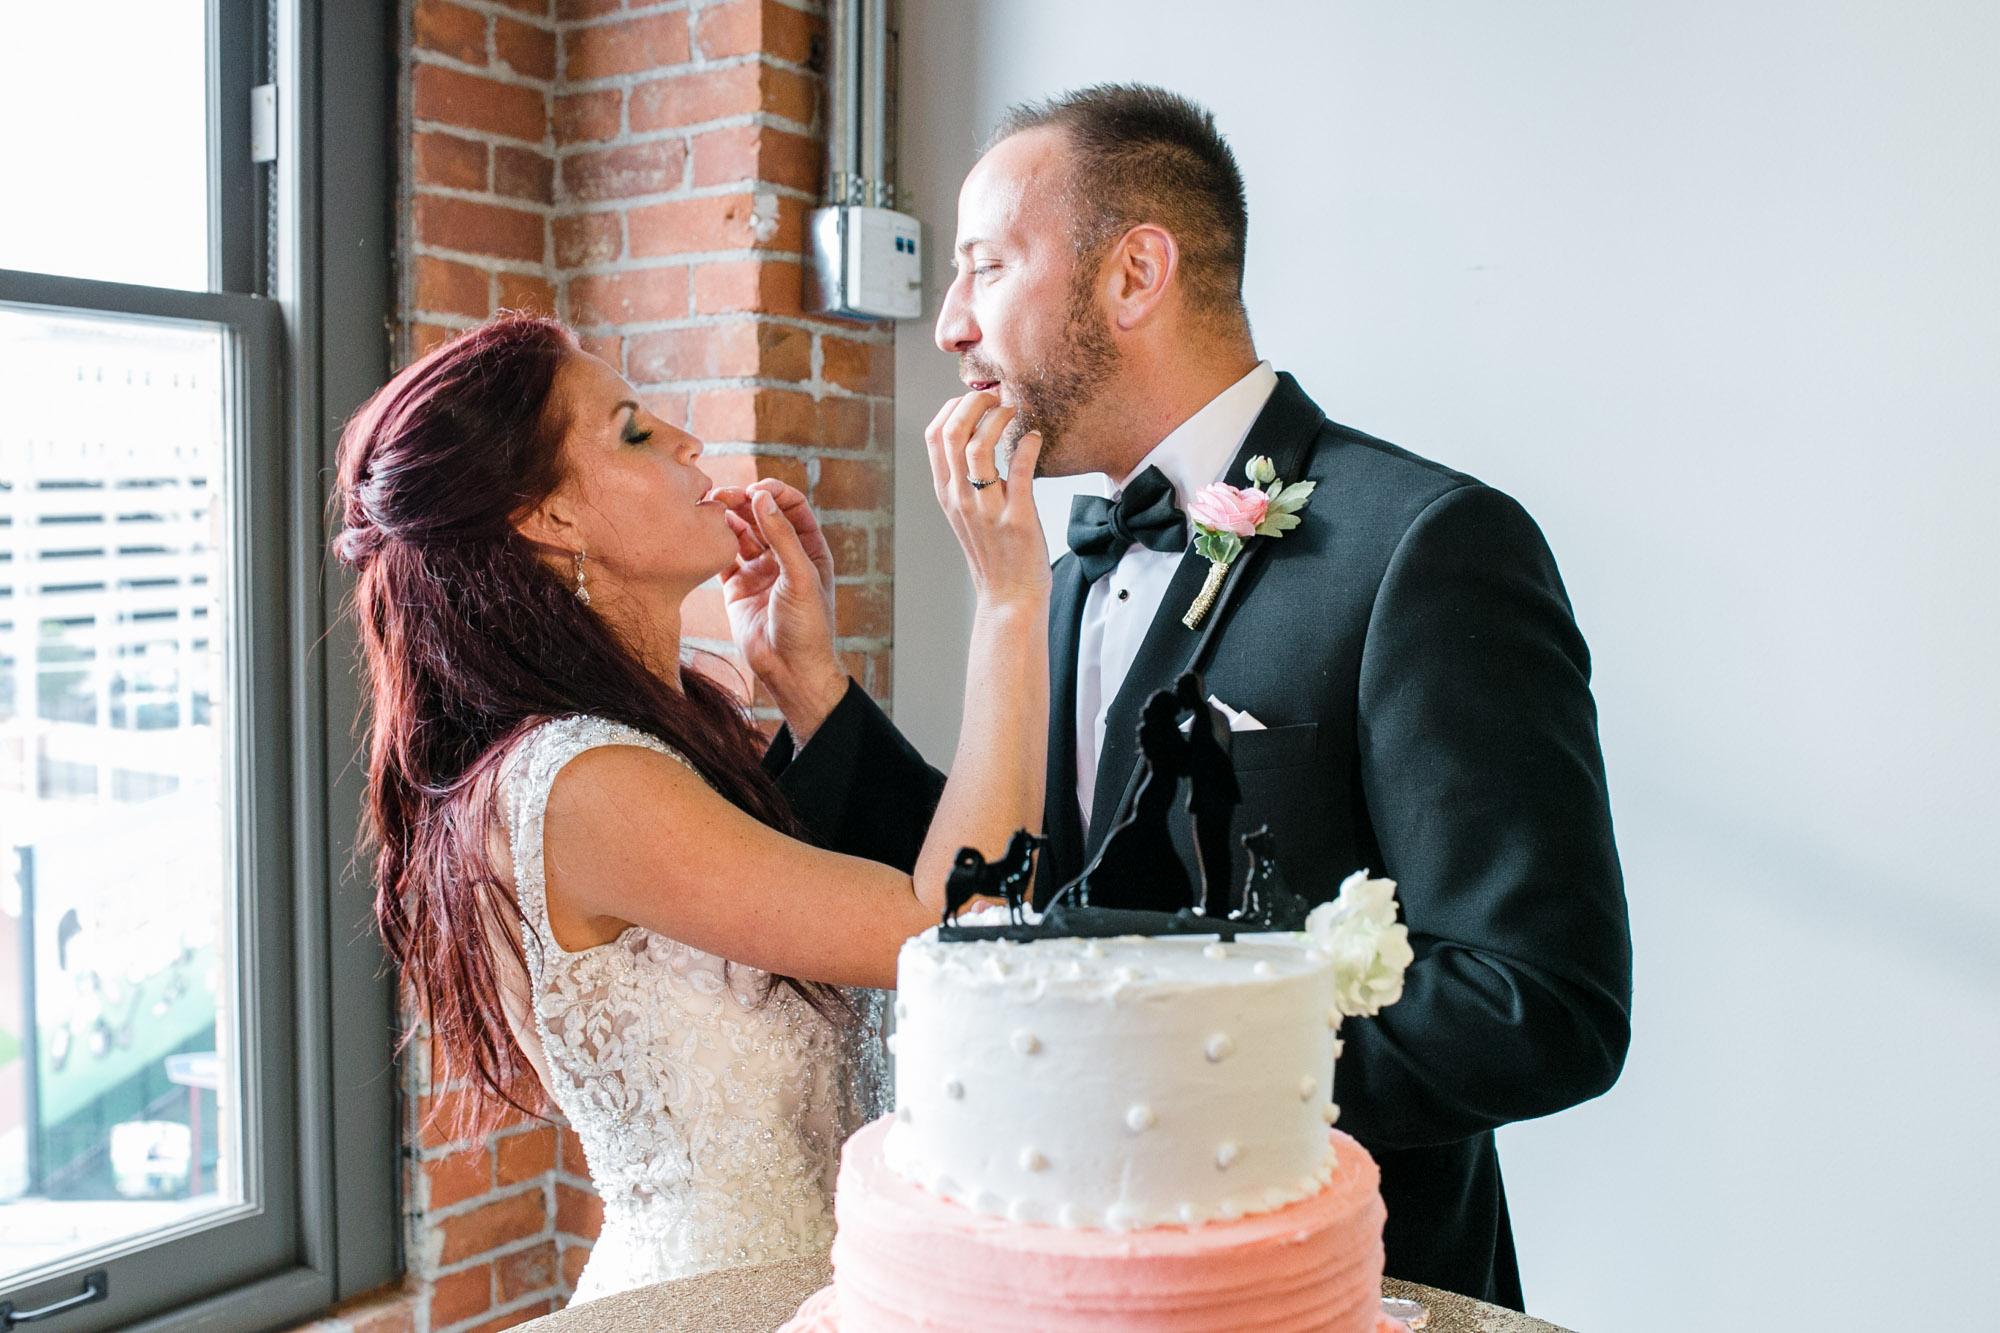 hensville-wedding-downtown-toledo-ohio (90 of 103).jpg